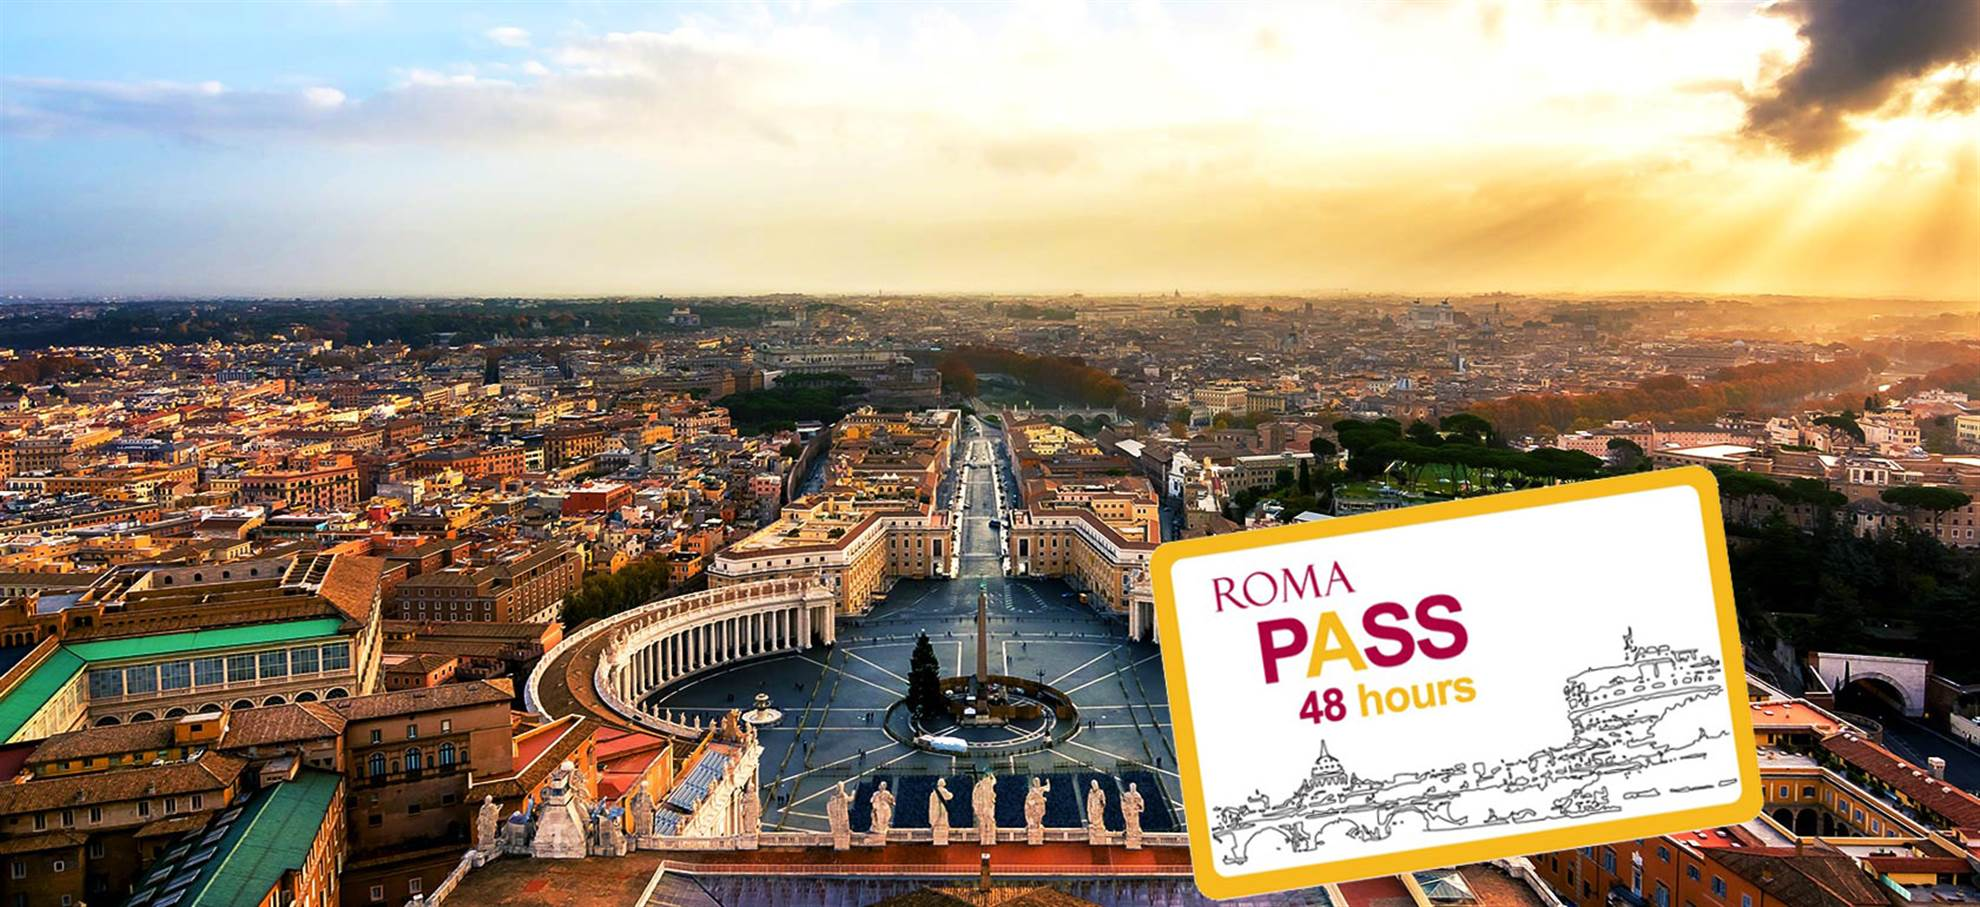 Roma Pass für 48 Stunden (wahlfrei: Basilika St. Peter)